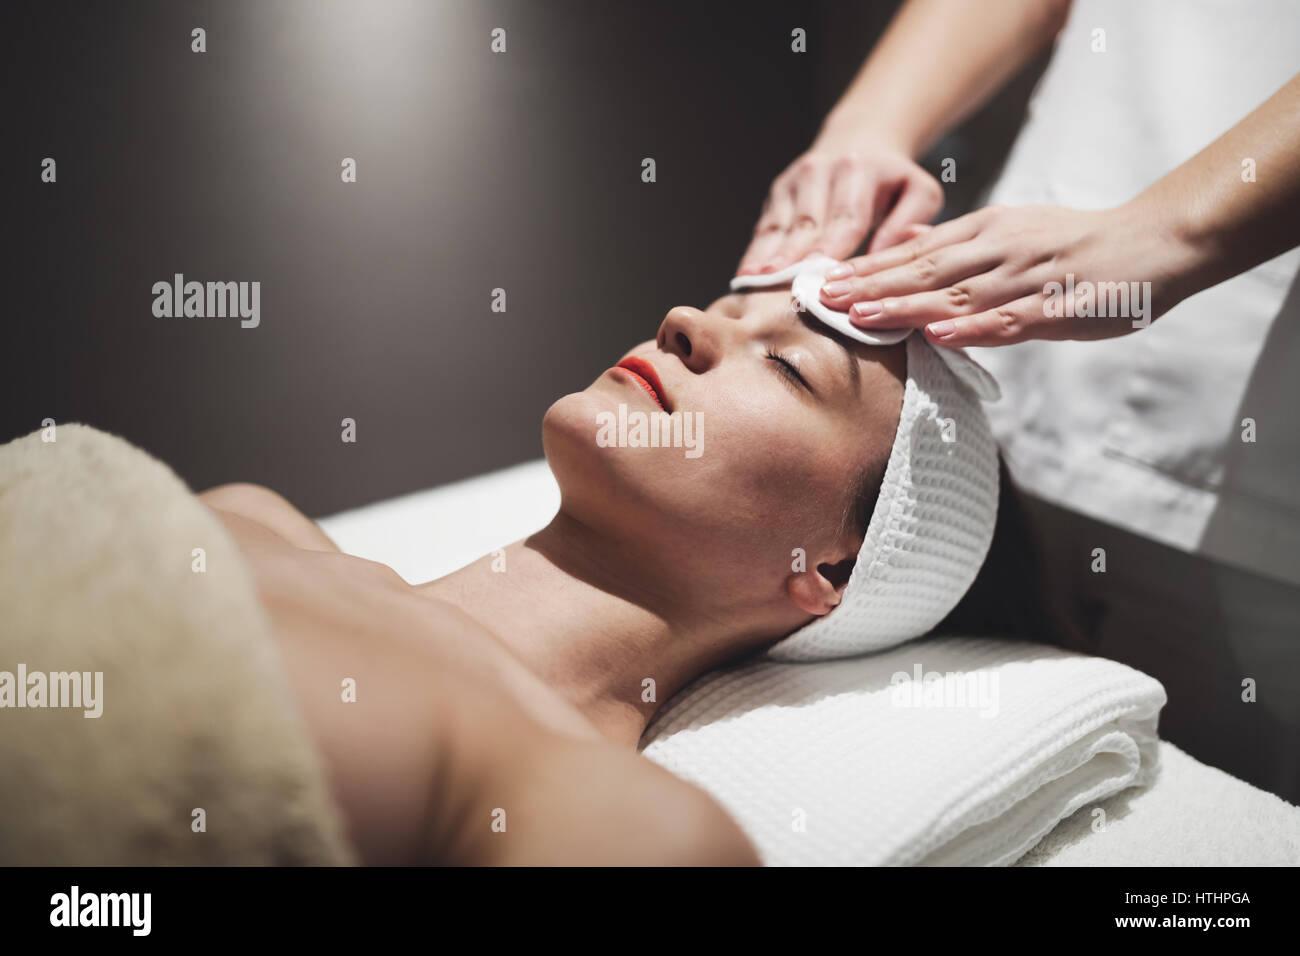 Woman enjoying skin and face treatment and massage - Stock Image